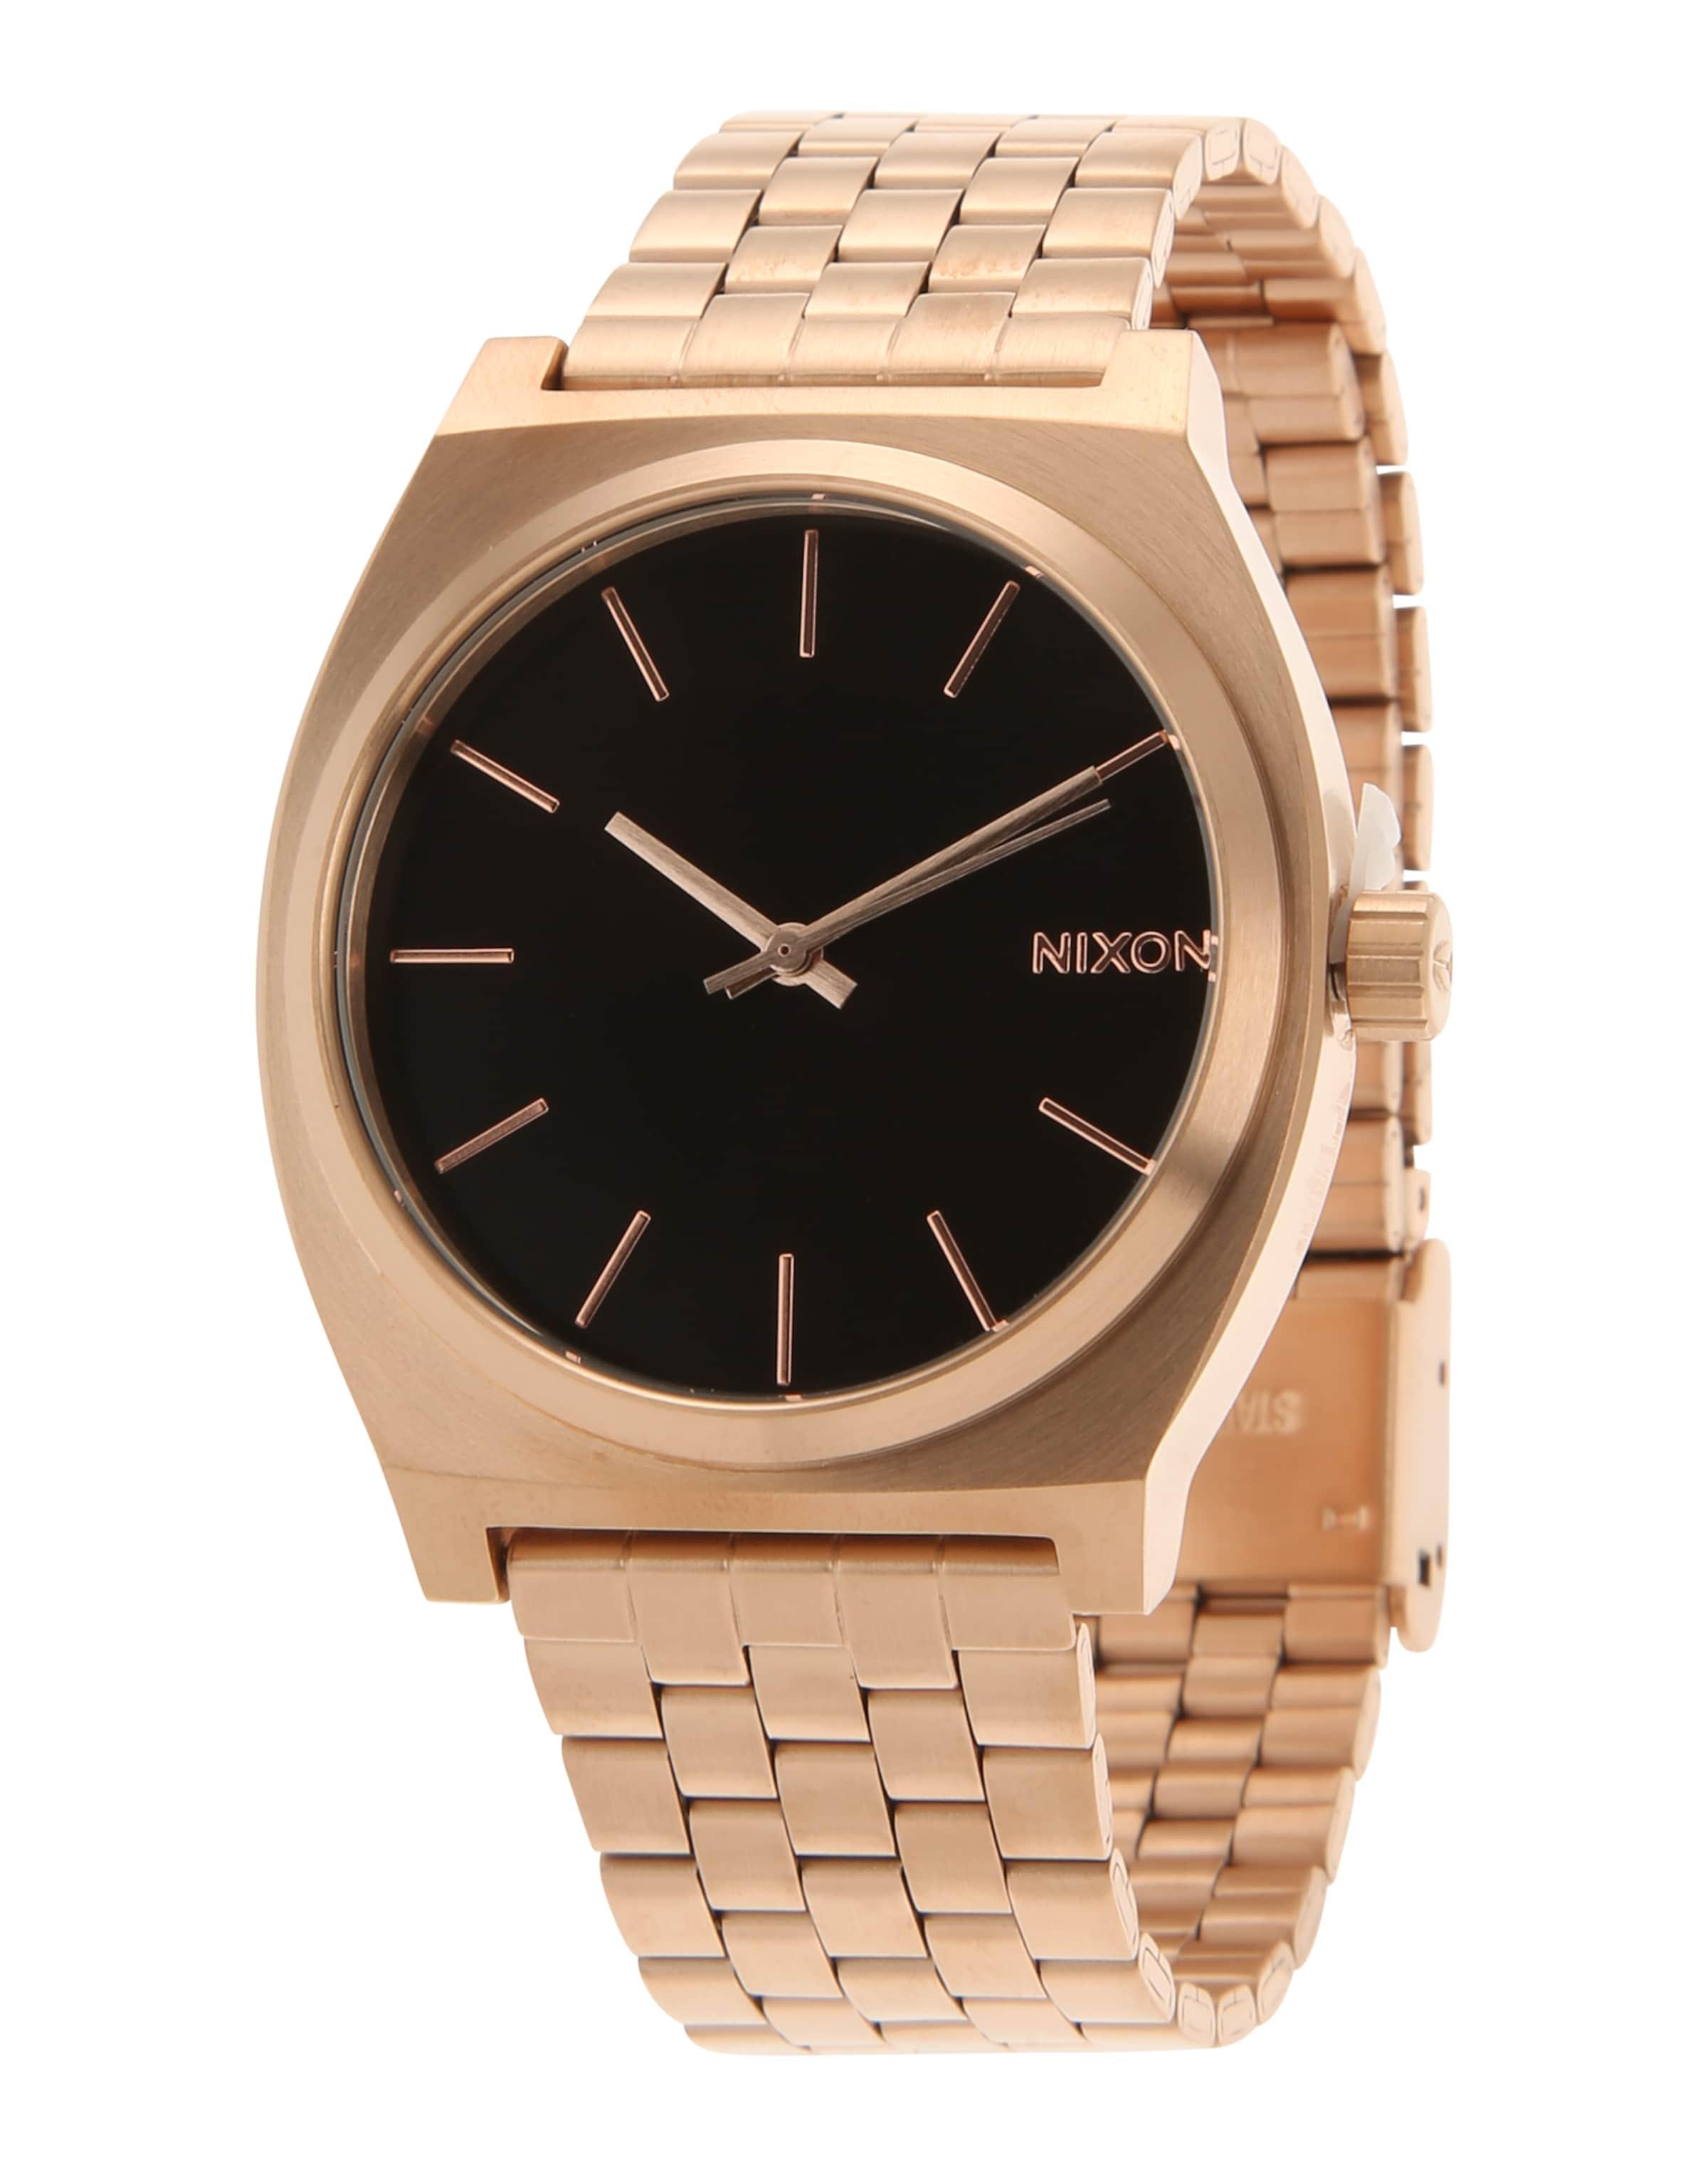 GoudZwart 'time Teller' Analoog Horloge In Nixon AL4qc3jR5